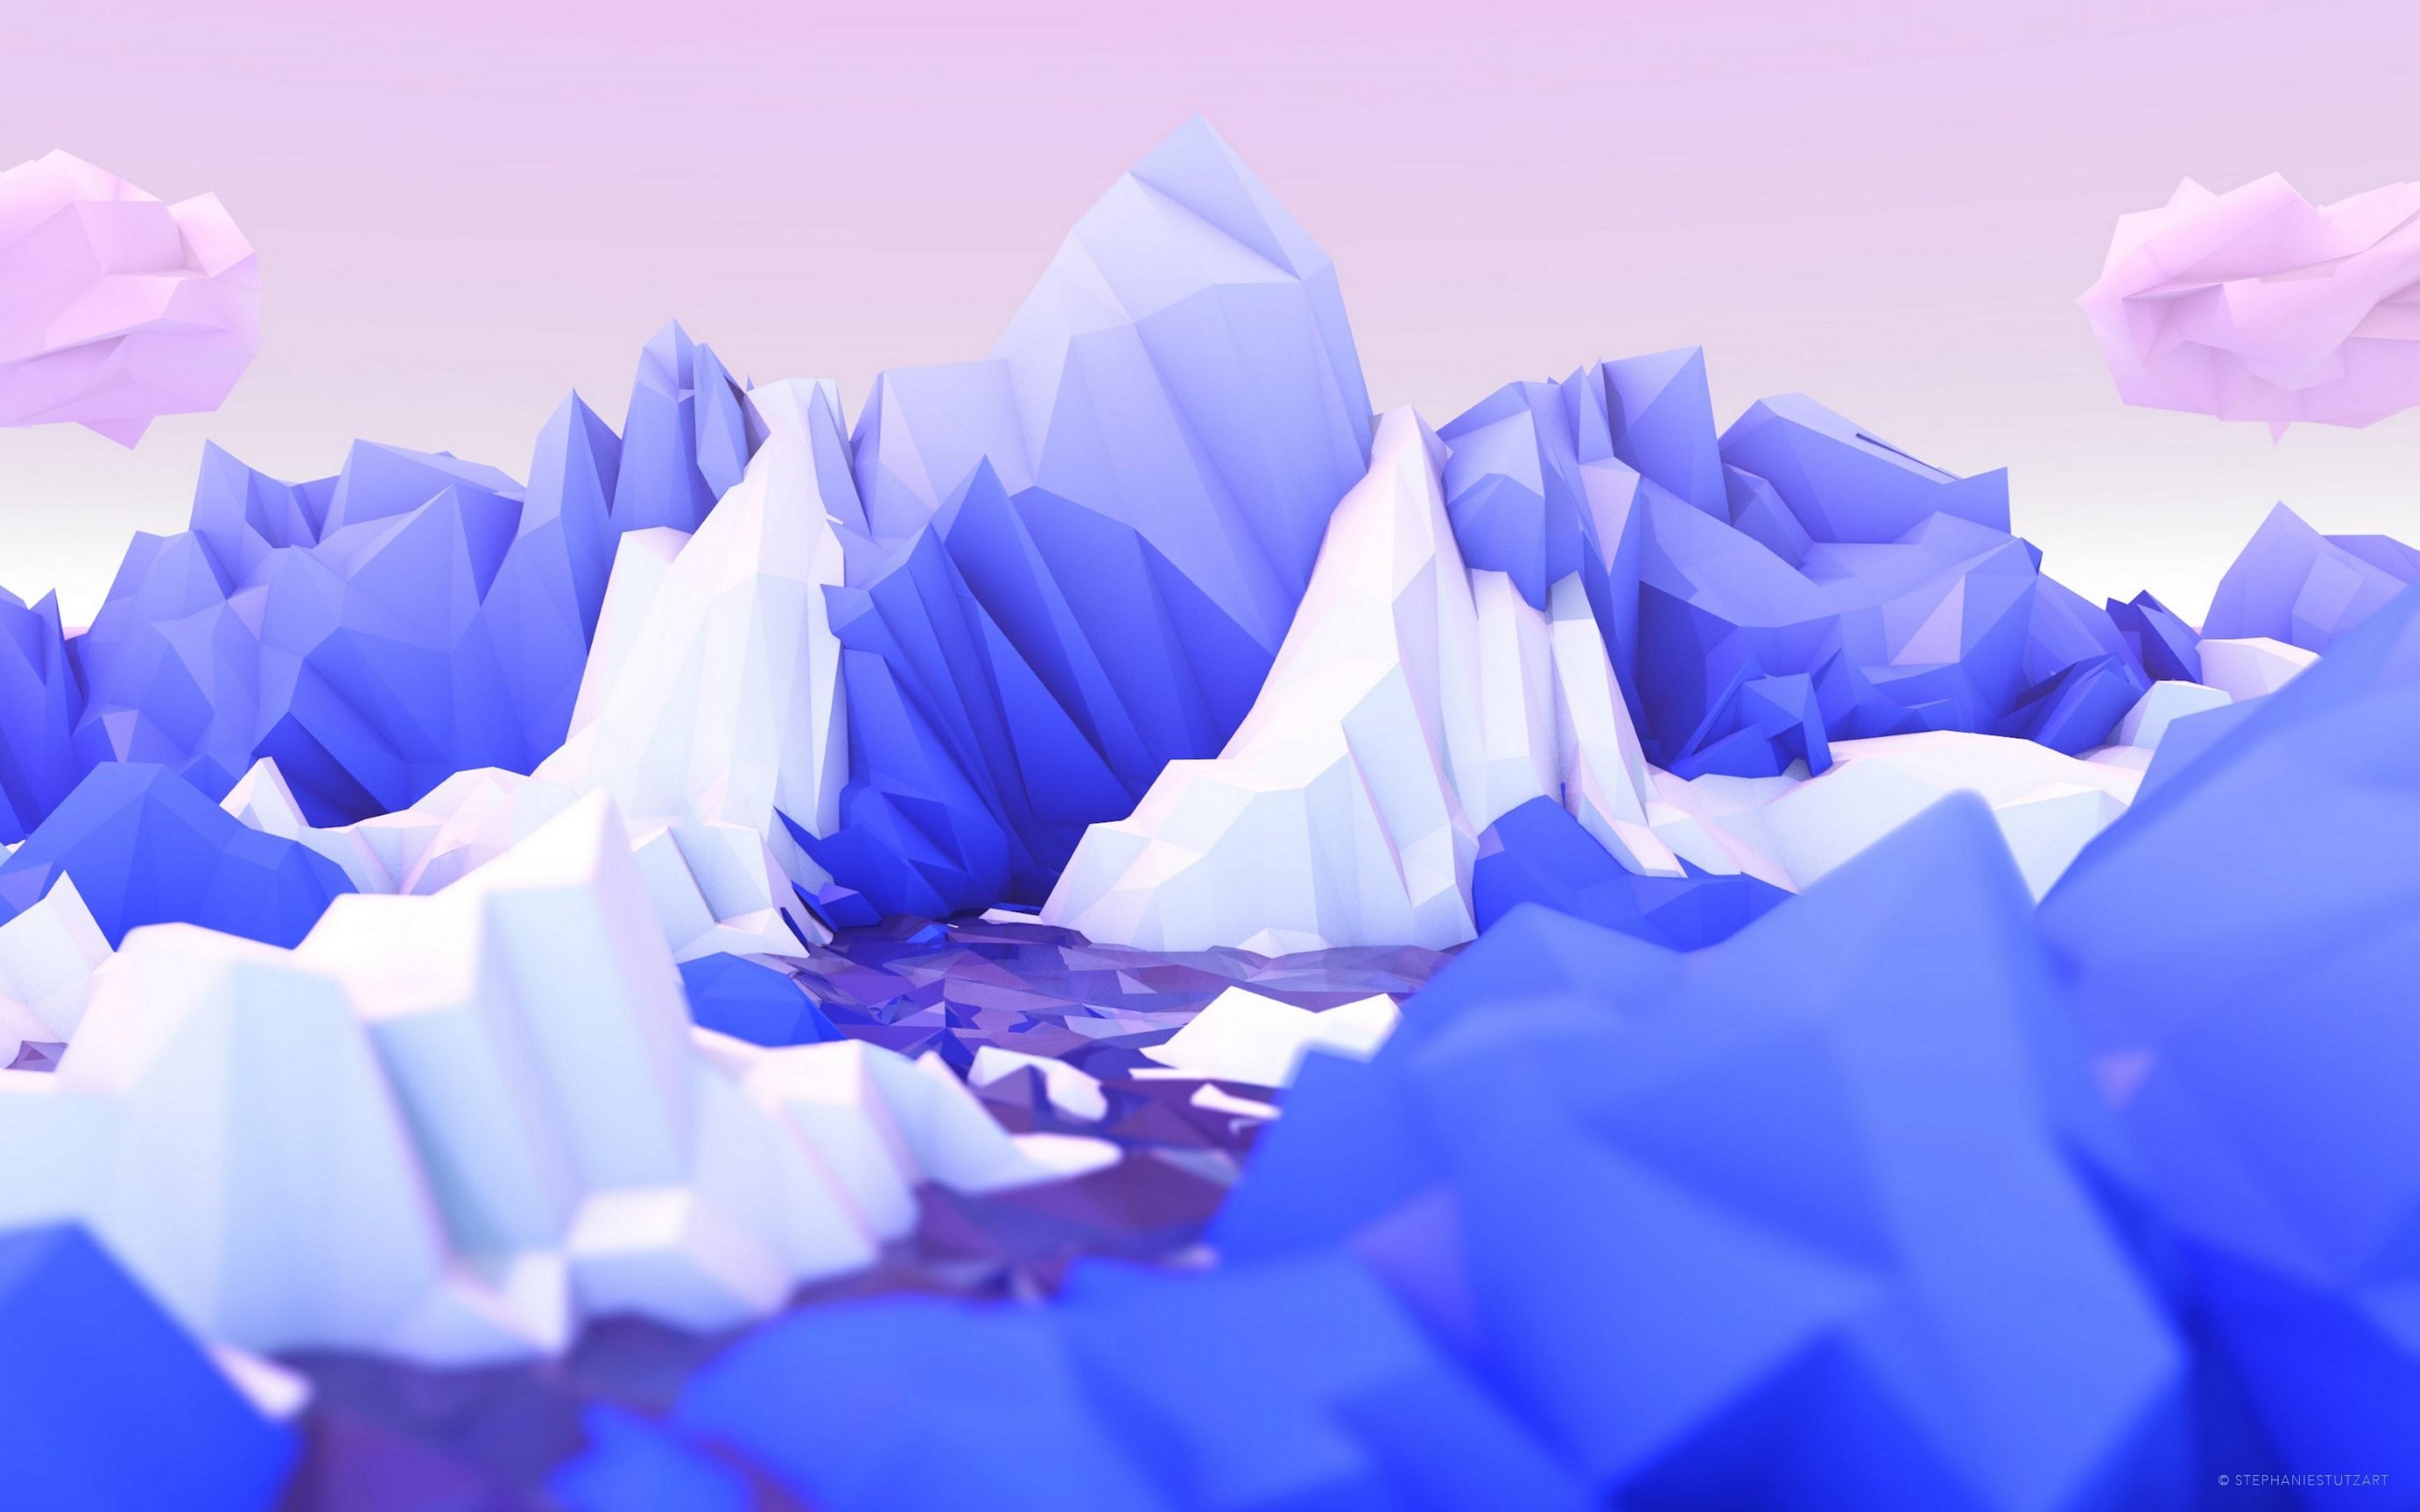 … Flat-Wallpapers-Full-HD-Free-Download-Wallpaperxyz.com- …